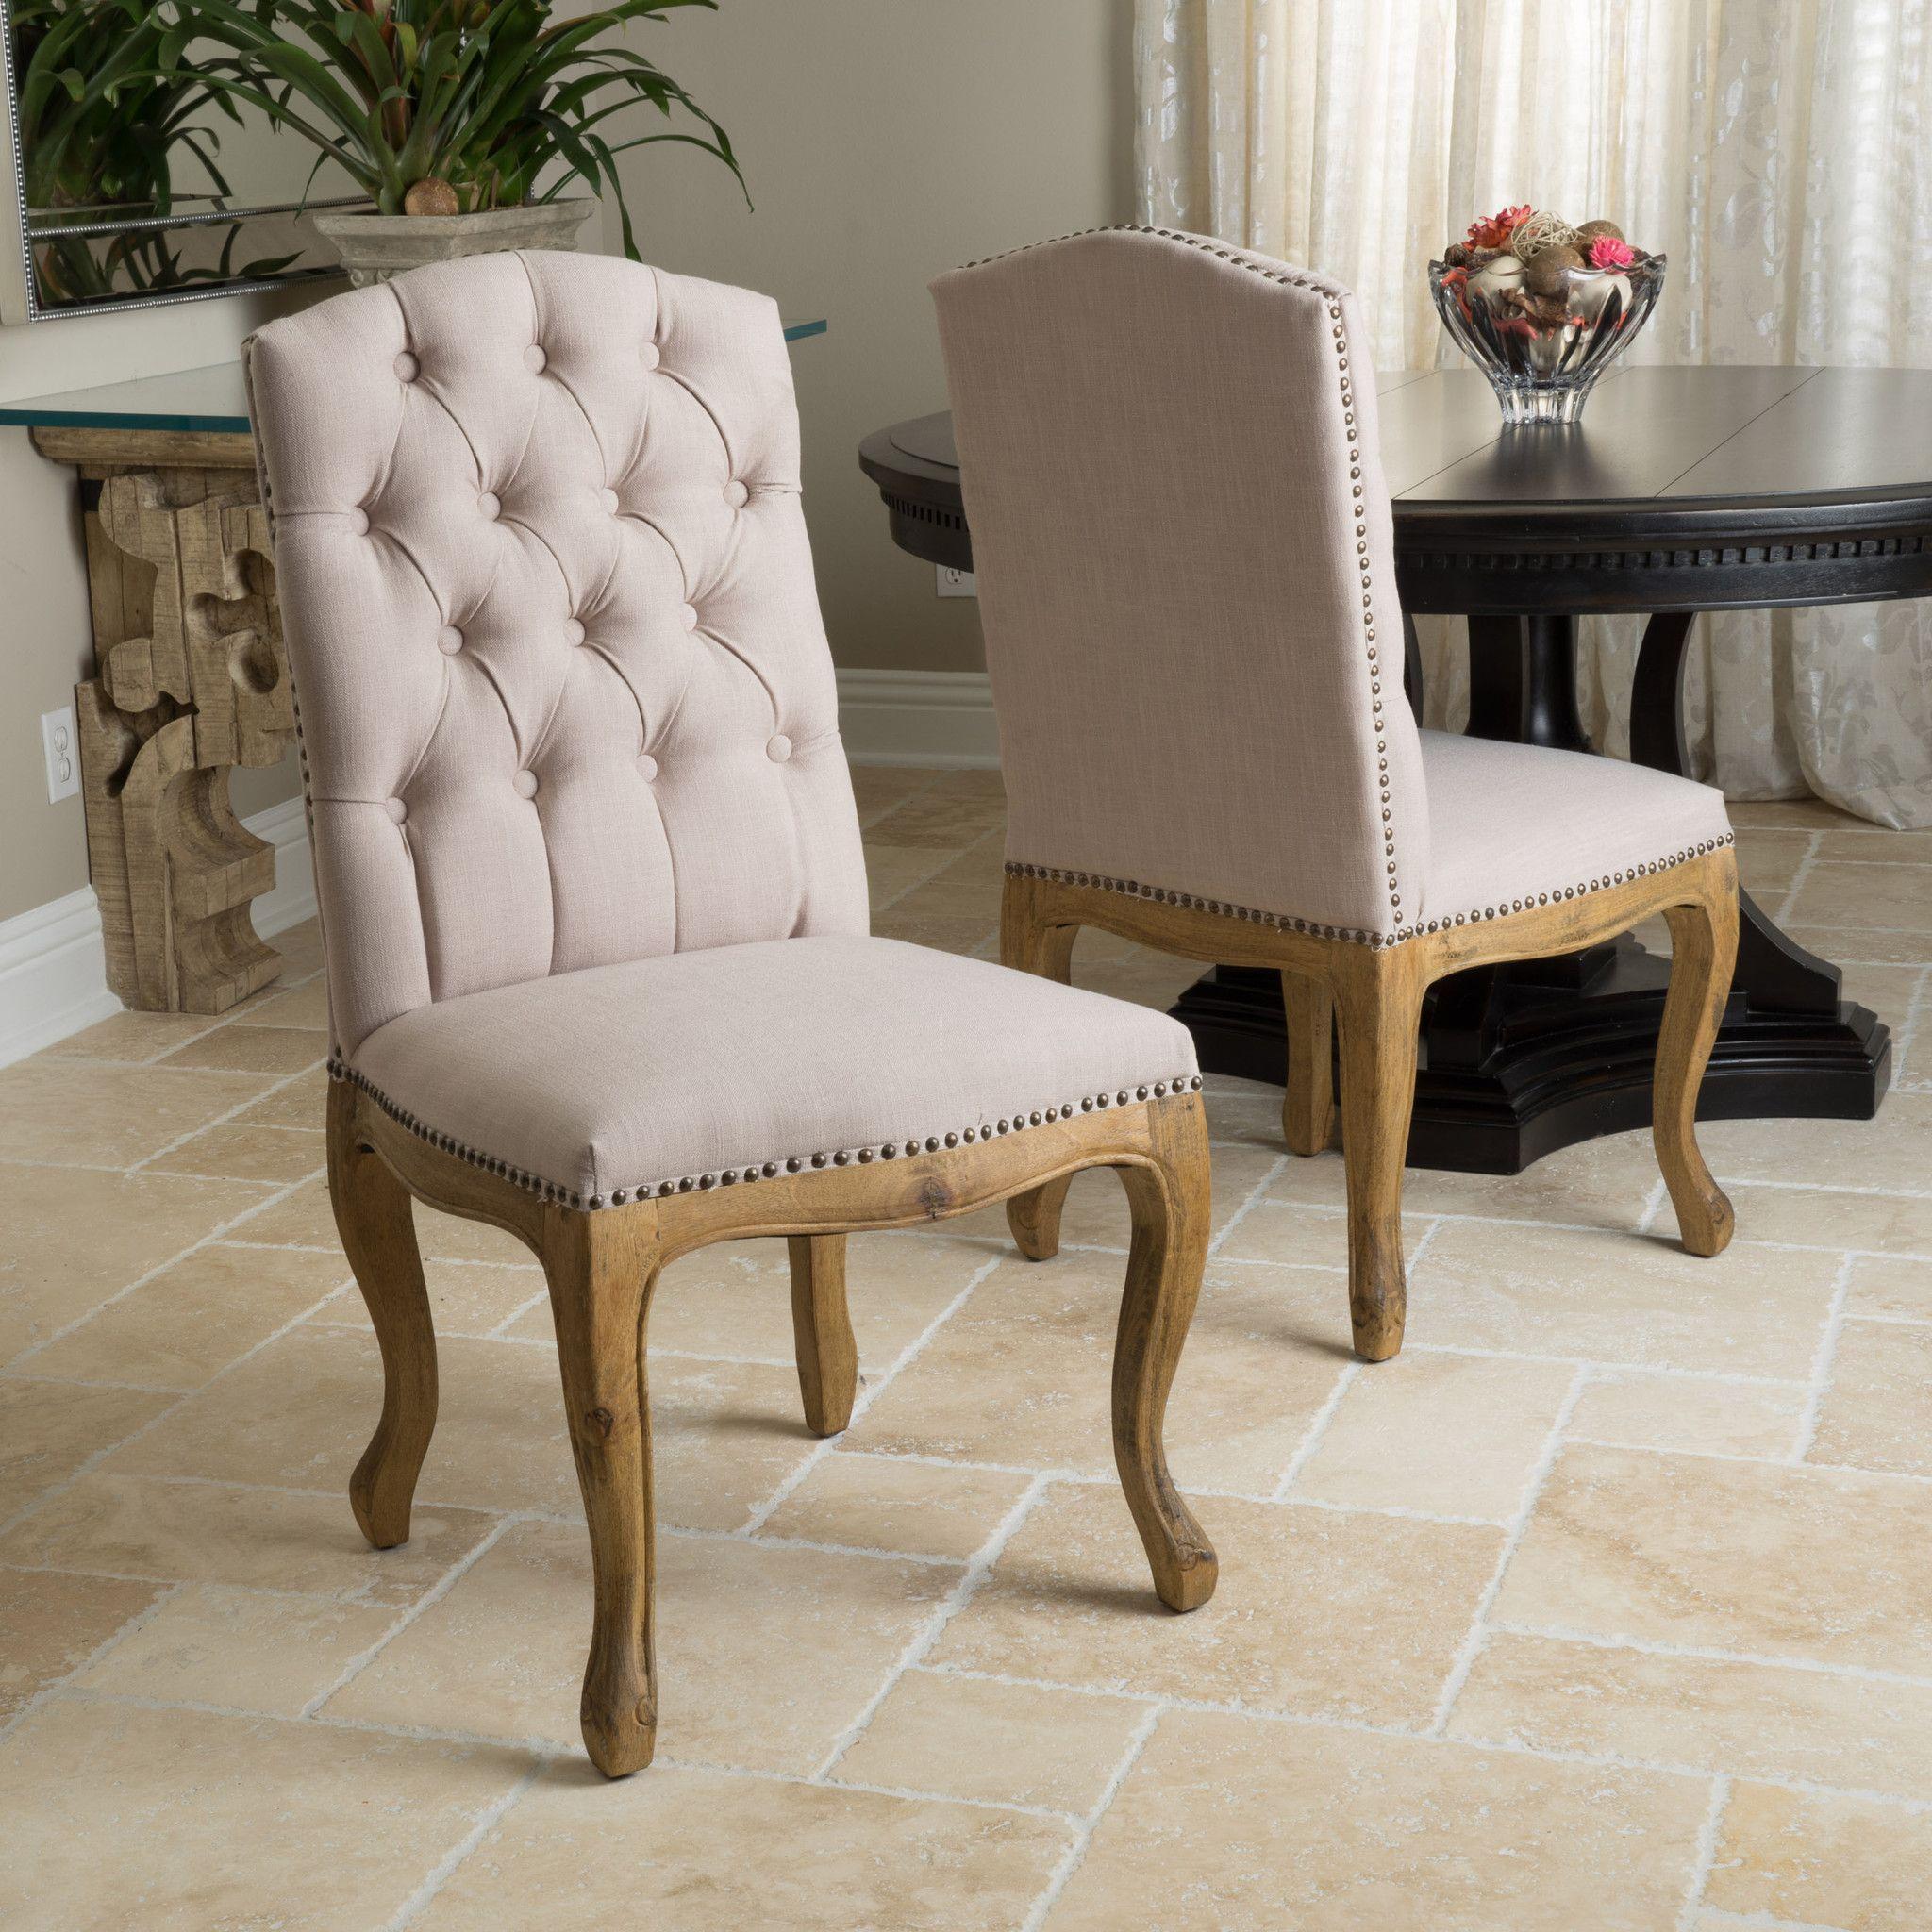 Jolie Tan Linen Weathered Dining Chair Set Set of 2